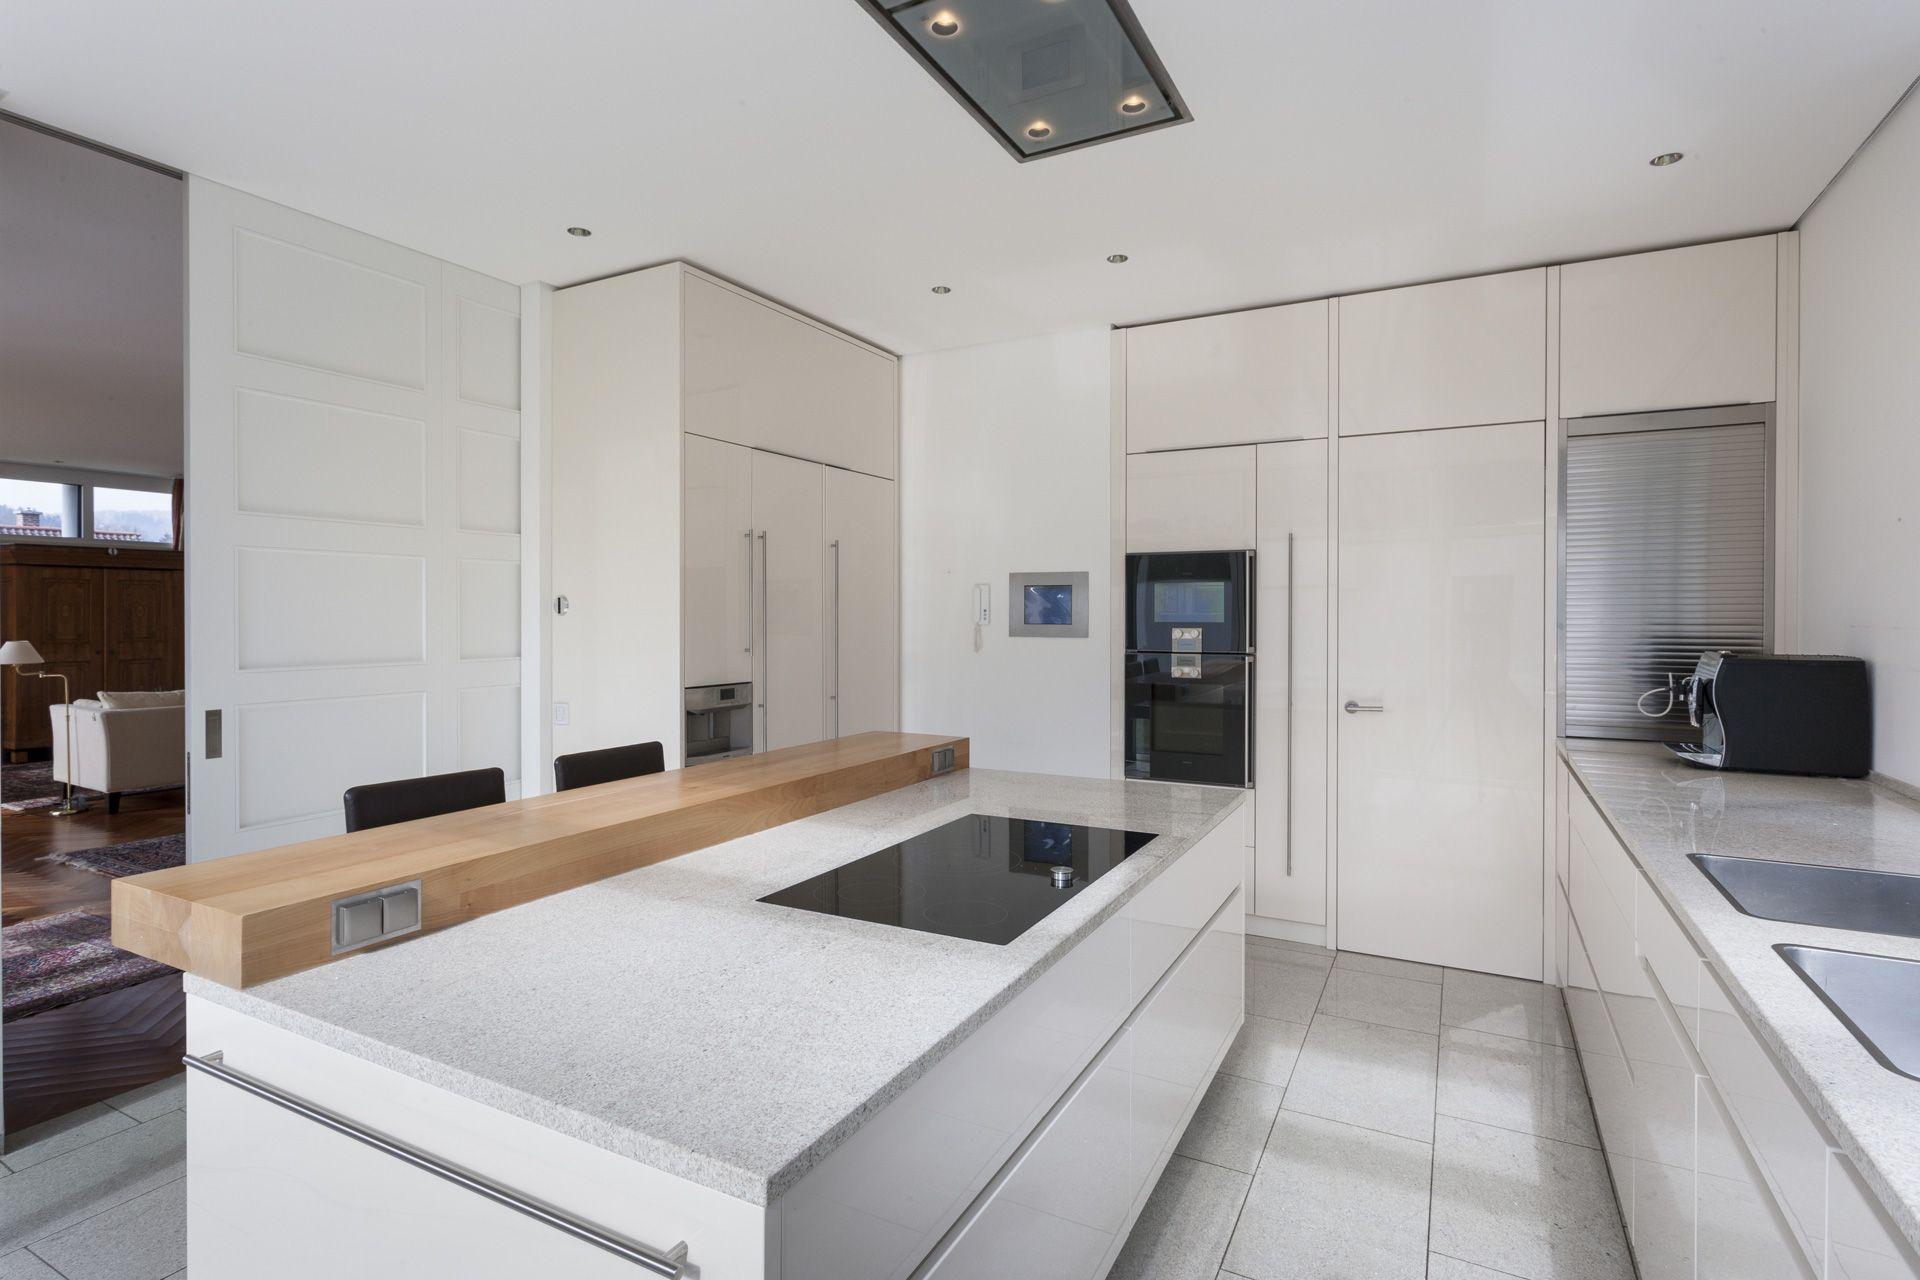 Küche Tresen Ikea